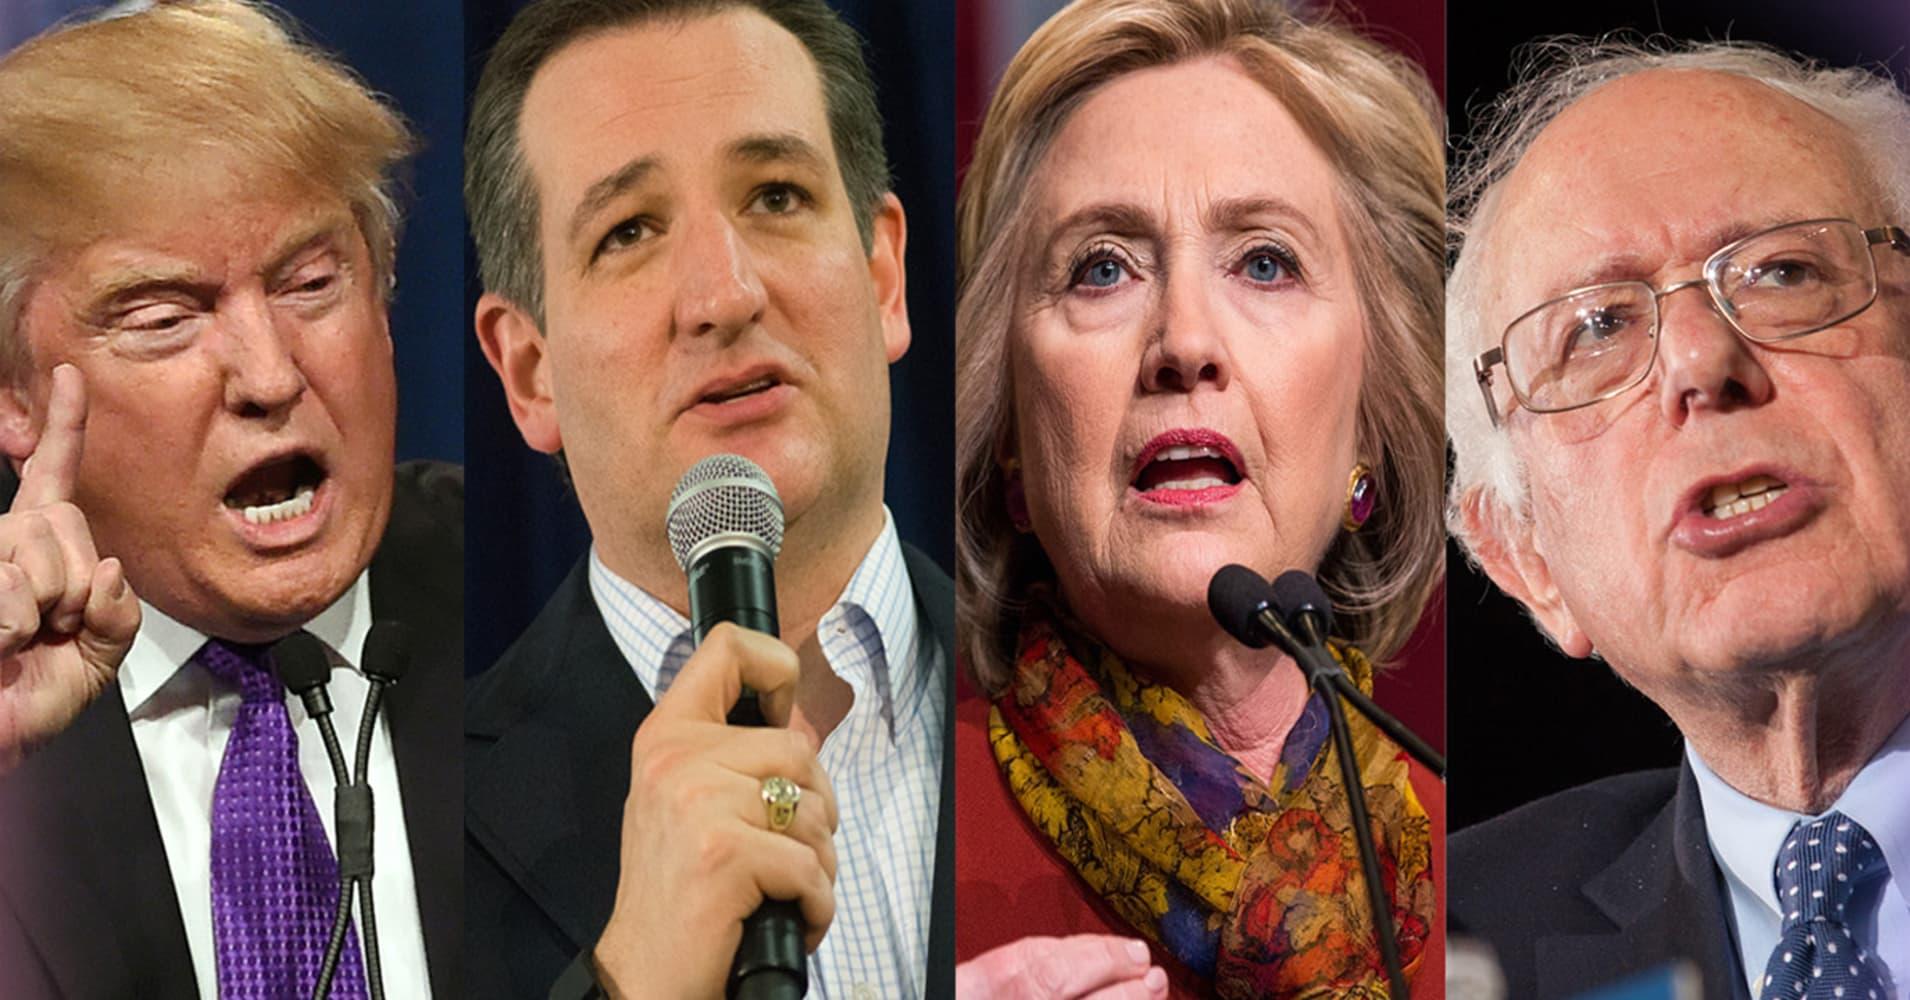 Donald Trump, Ted Cruz, Hillary Clinton and Bernie Sanders